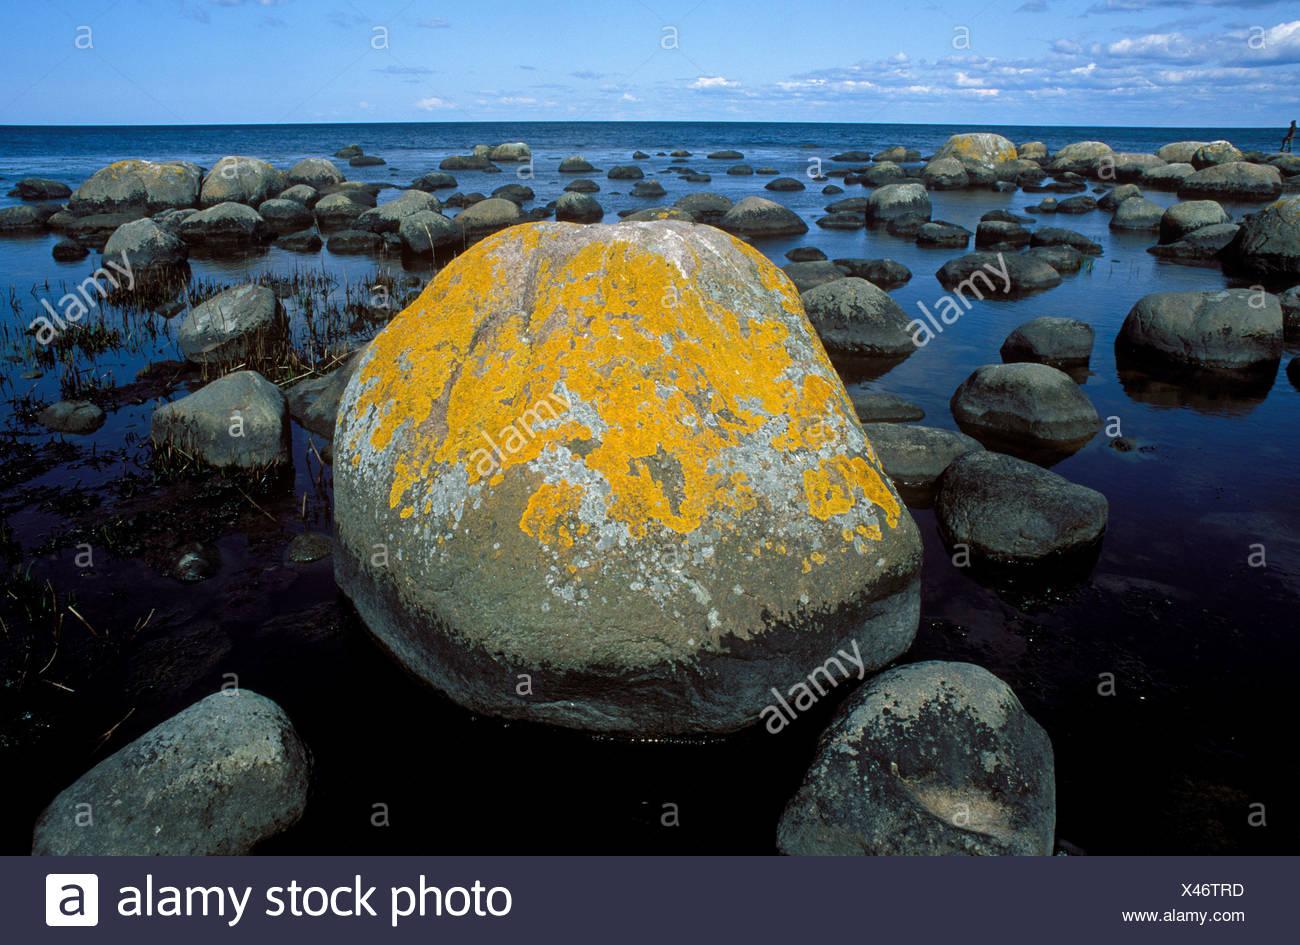 Stenshuvud National Park, Baltic Sea, Skane, Sweden - Stock Image